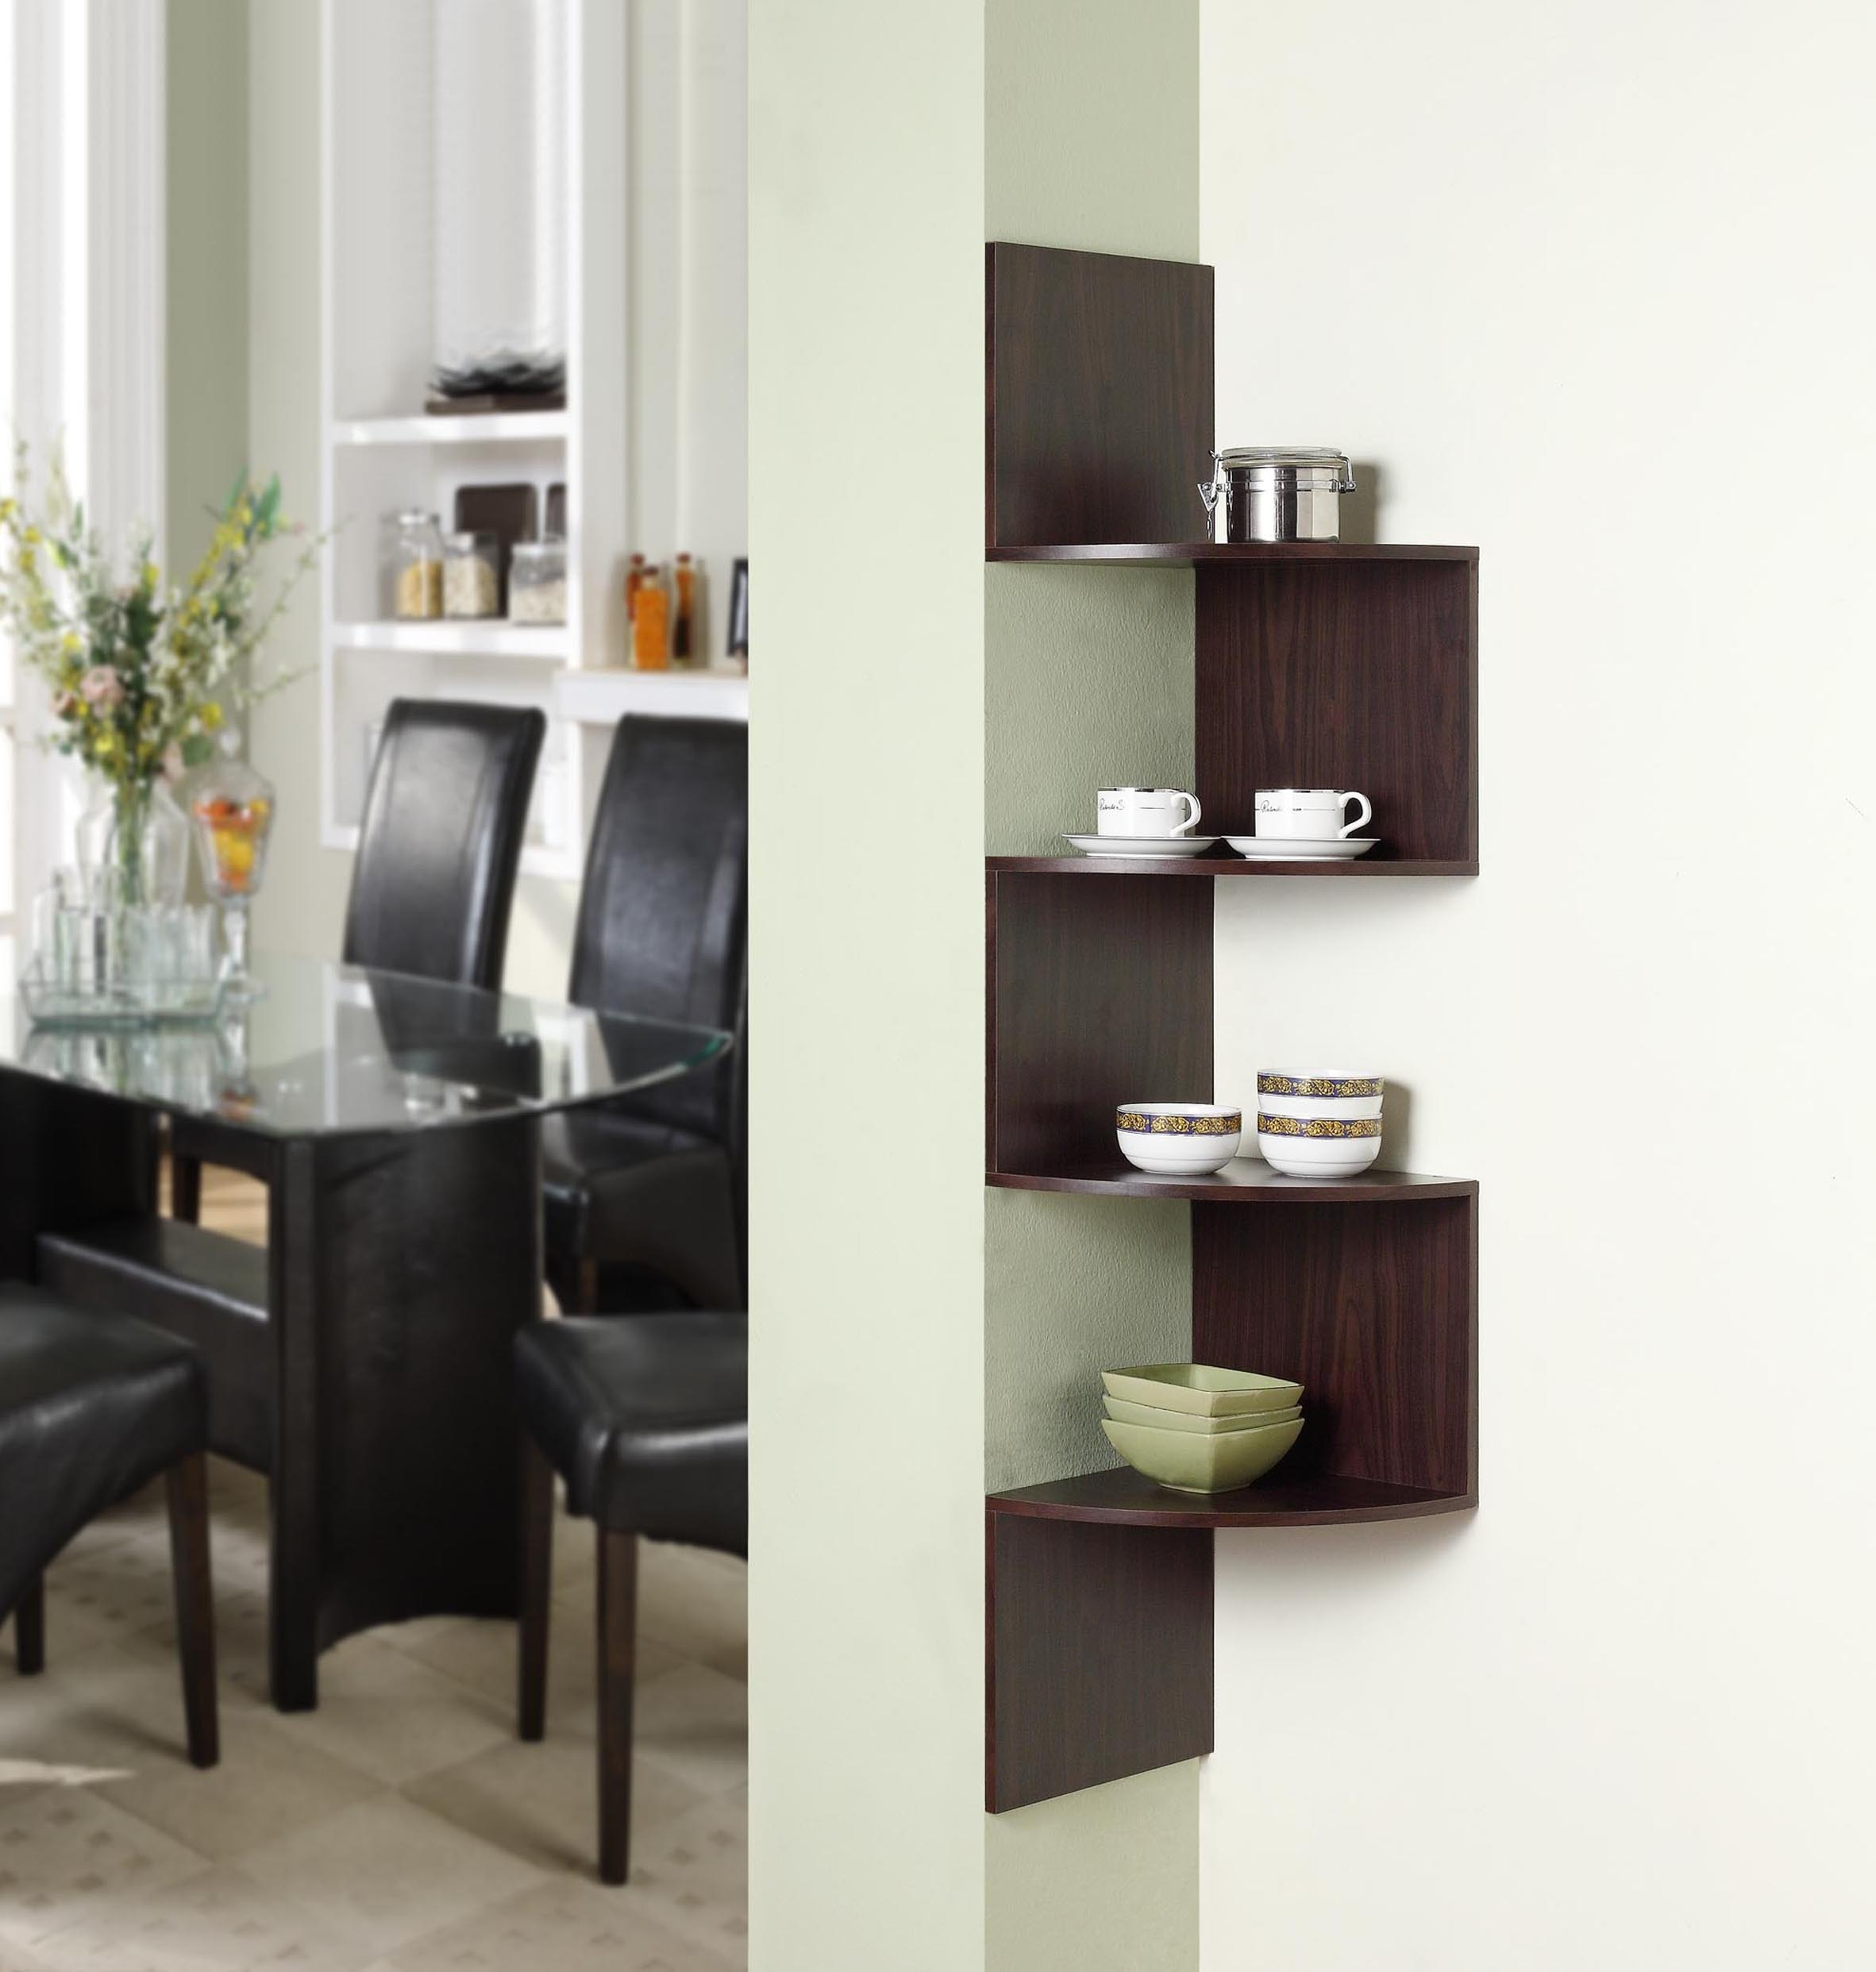 4D Concepts 99300 Hanging Corner Storage- Espresso